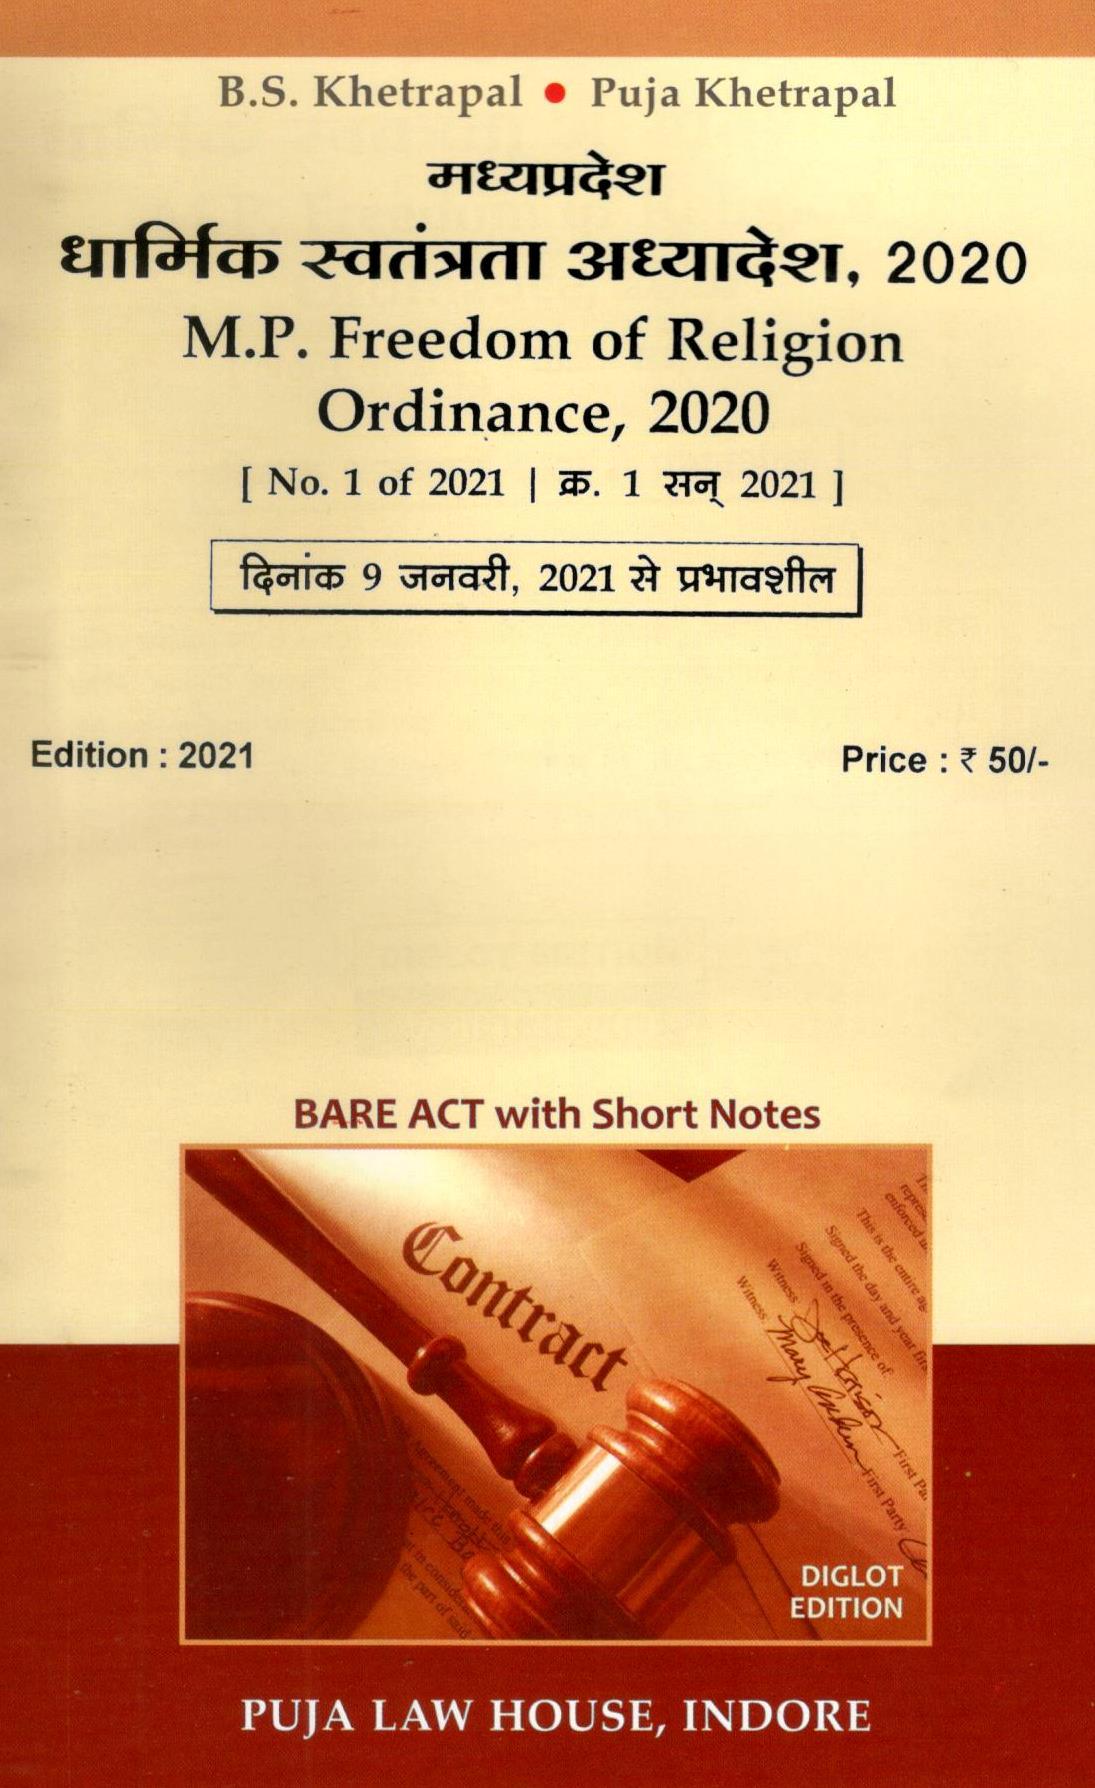 Madhya Pradesh Freedom of Religion Ordinance, 2020 / मध्य प्रदेश धार्मिक स्वतंत्रता अध्यादेश, 2020